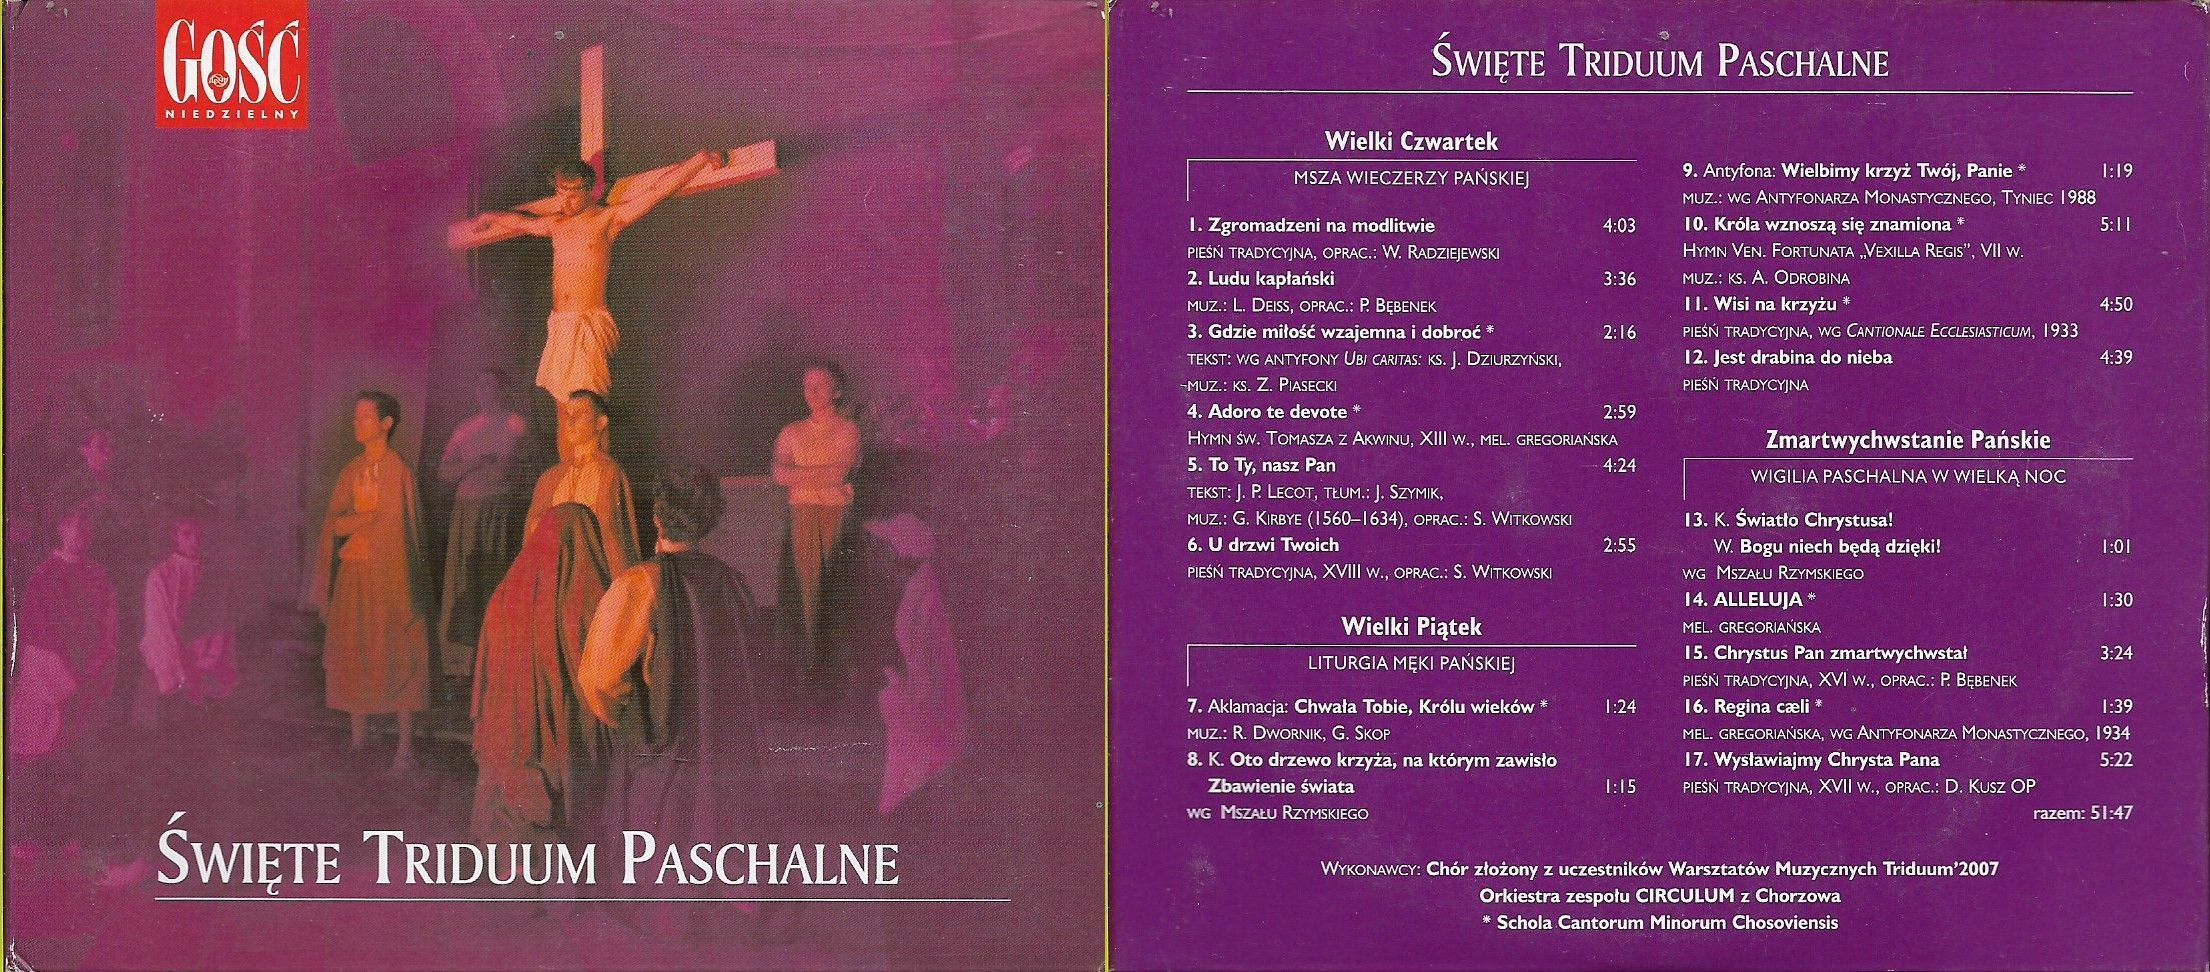 Święte Triduum Paschalne CD